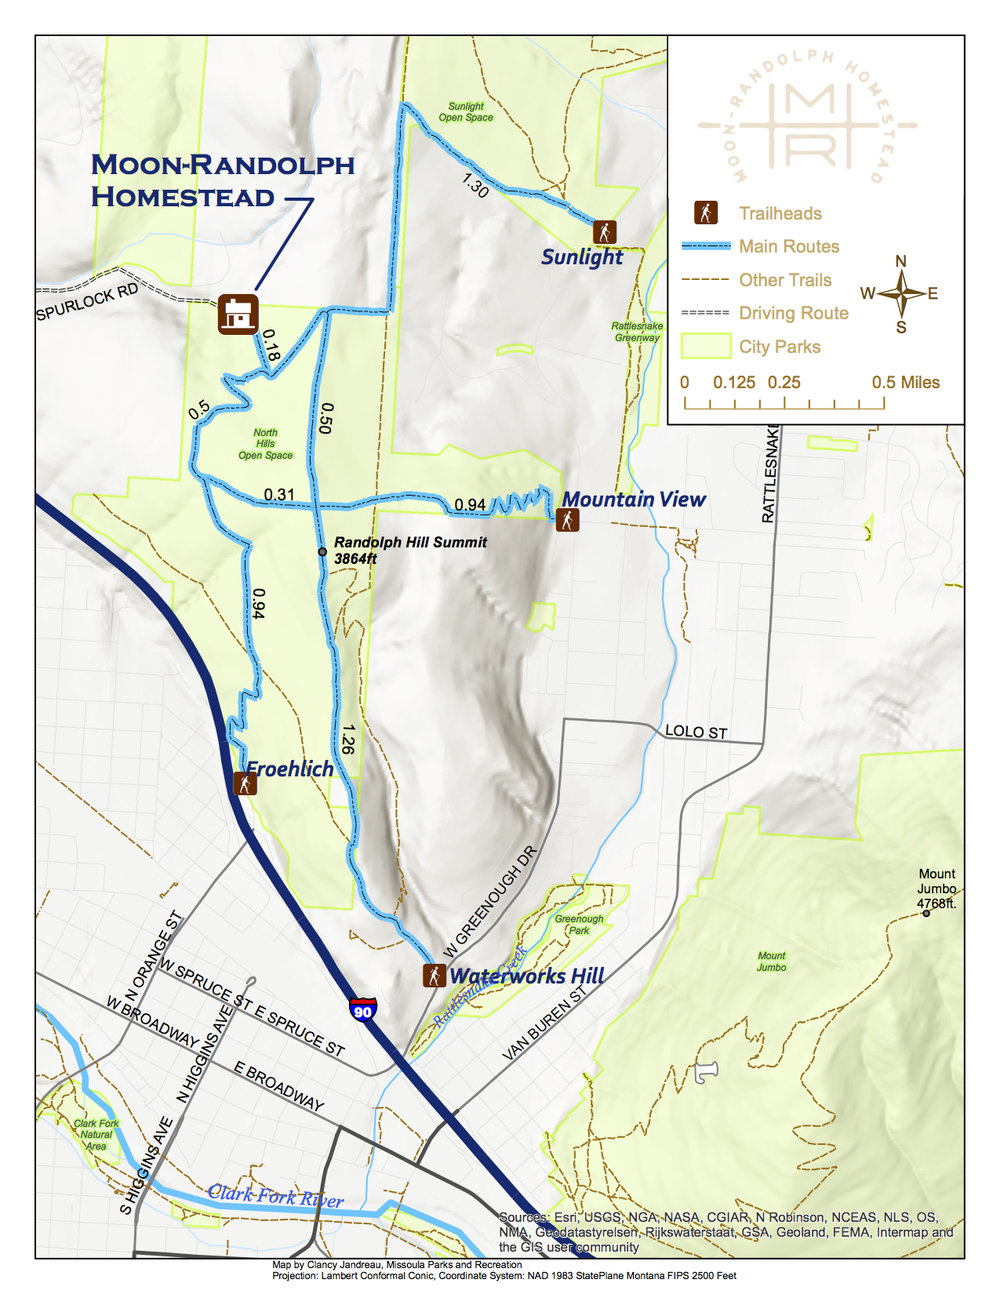 Maps MoonRandolph Homestead